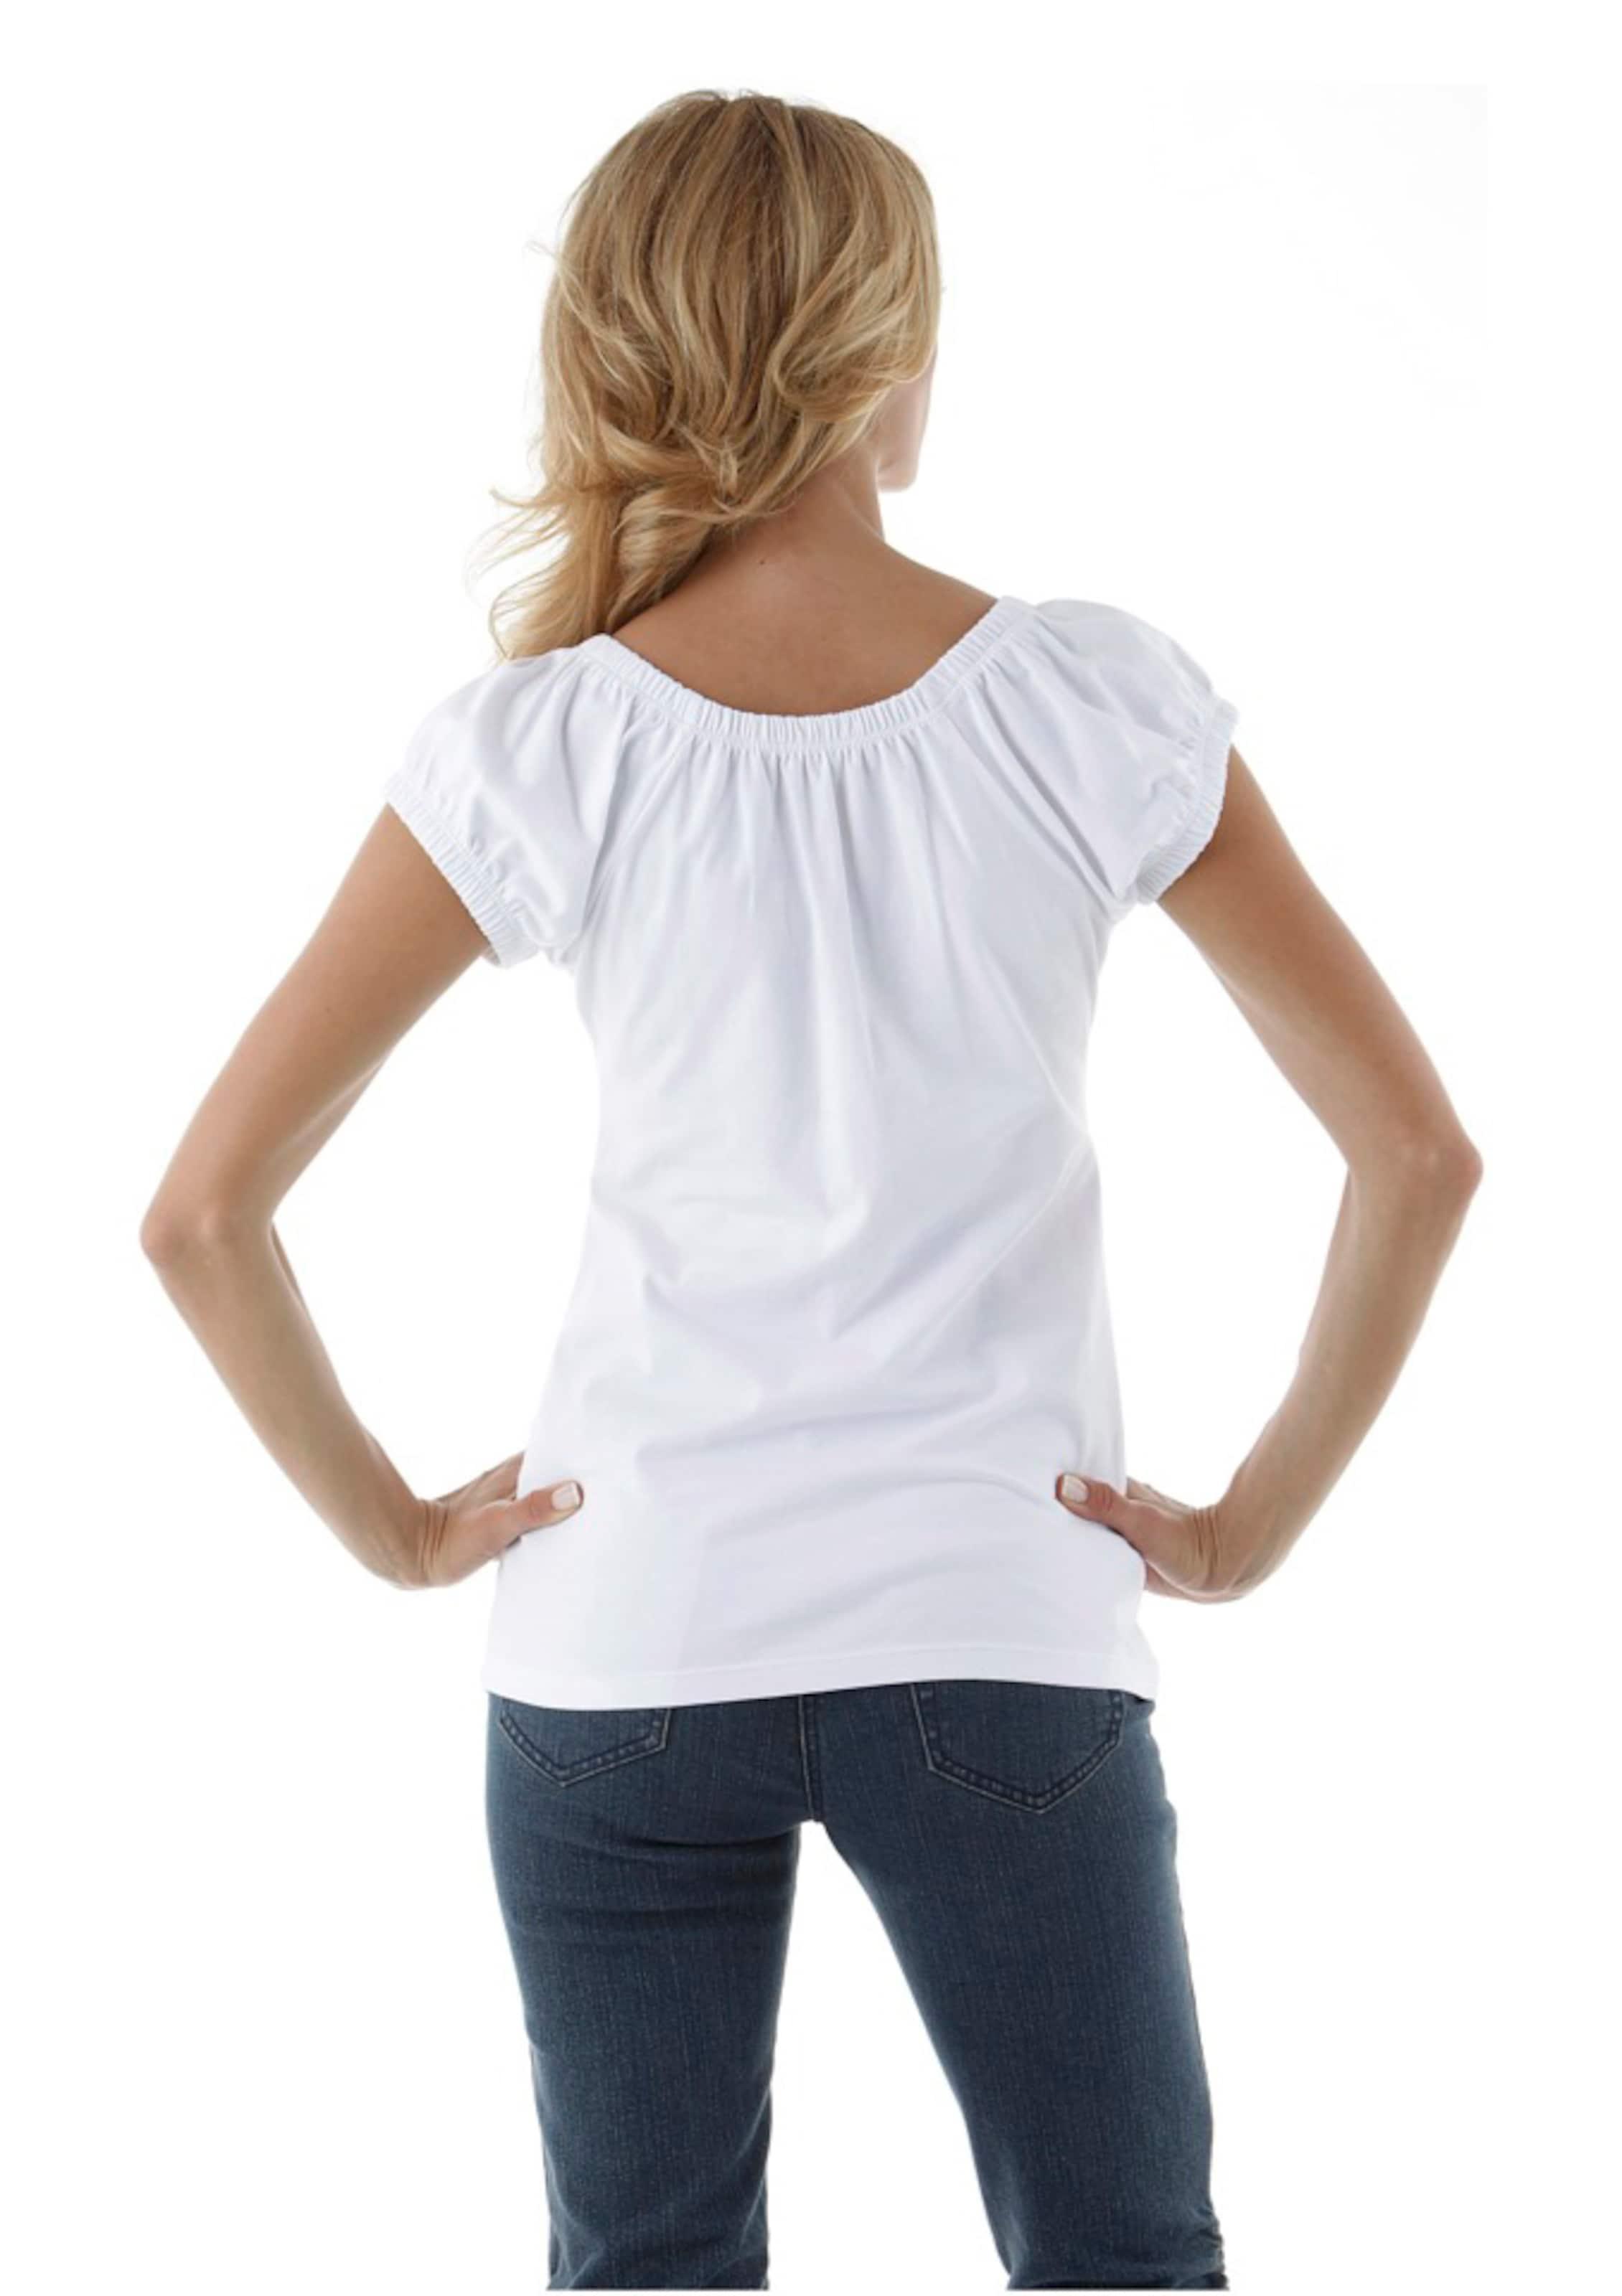 Äußerst CHEER Rundhalsshirt Rabatt Finish Ausverkaufs-Shop Steckdose Shop 2hQFChakjb